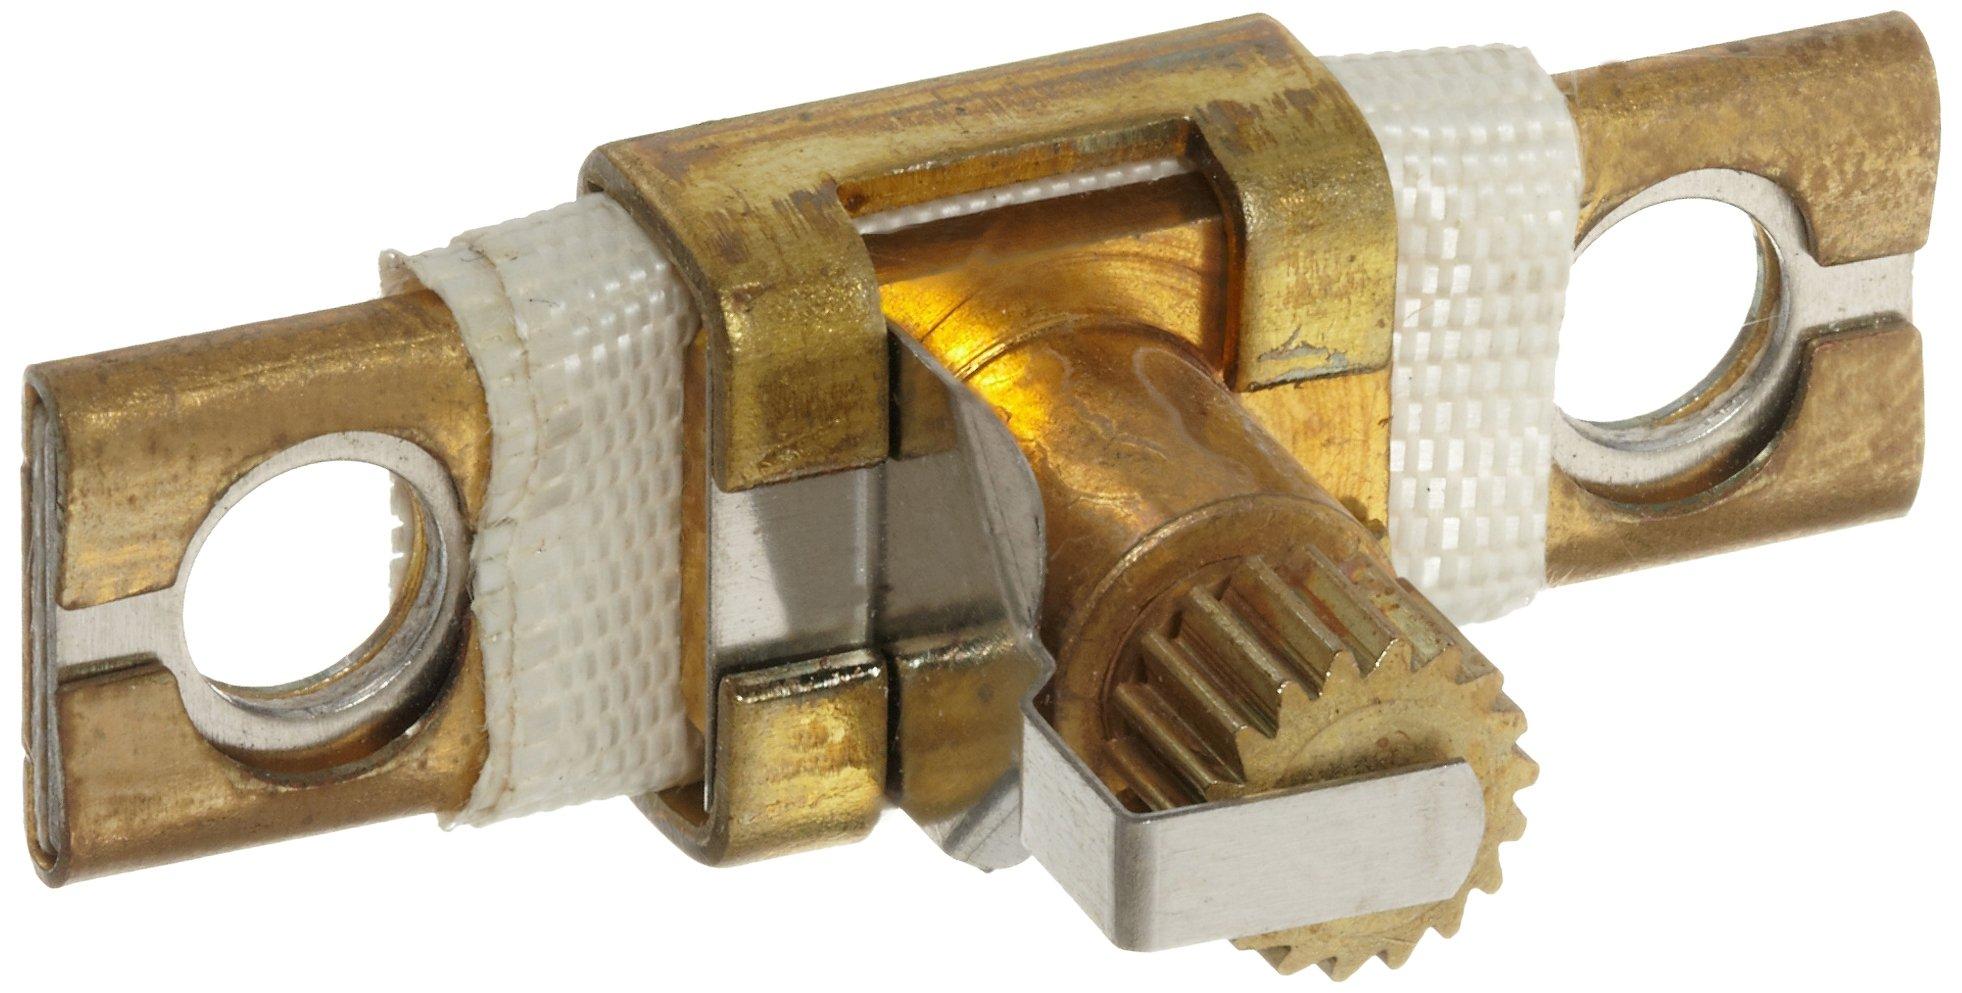 Siemens SMFH43 Heater Element, Class SMF, 7.58-8.15A Motor Full Load Current